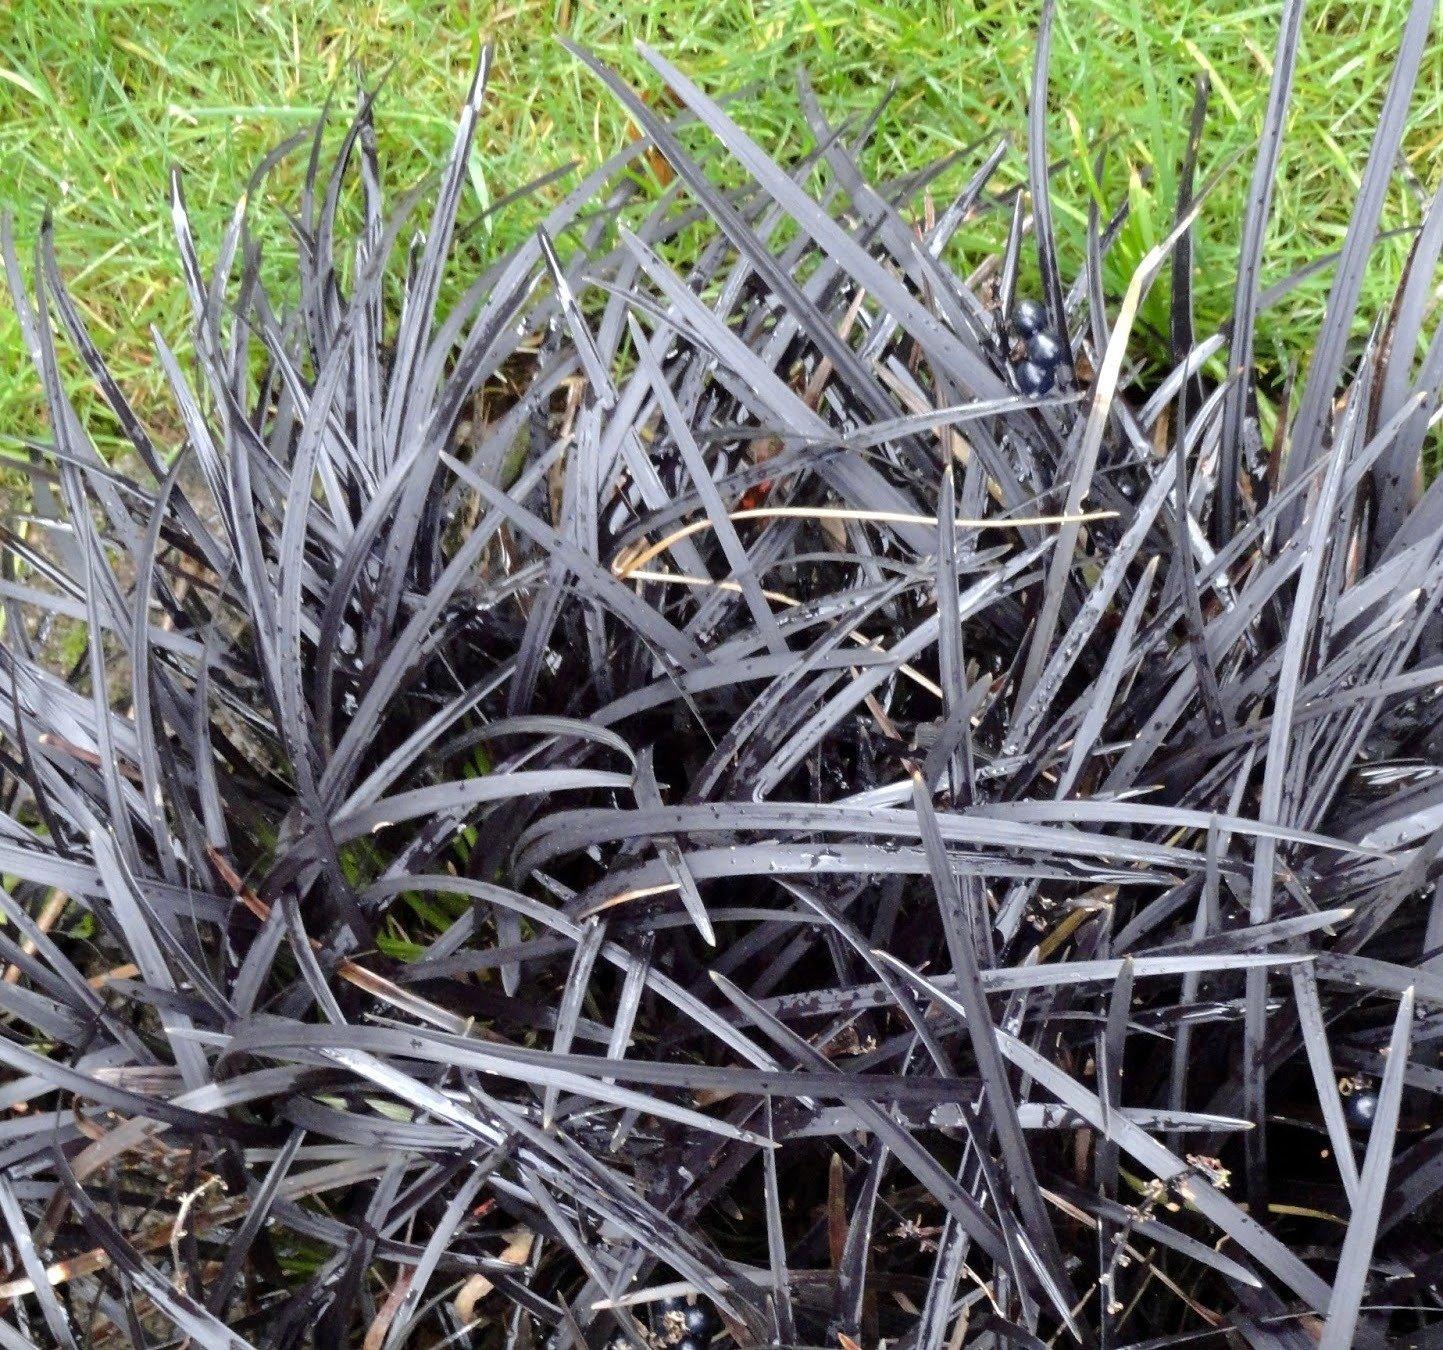 3 x 9cm Potted Plants Ophiopogon planiscapus Nigrescens AGM